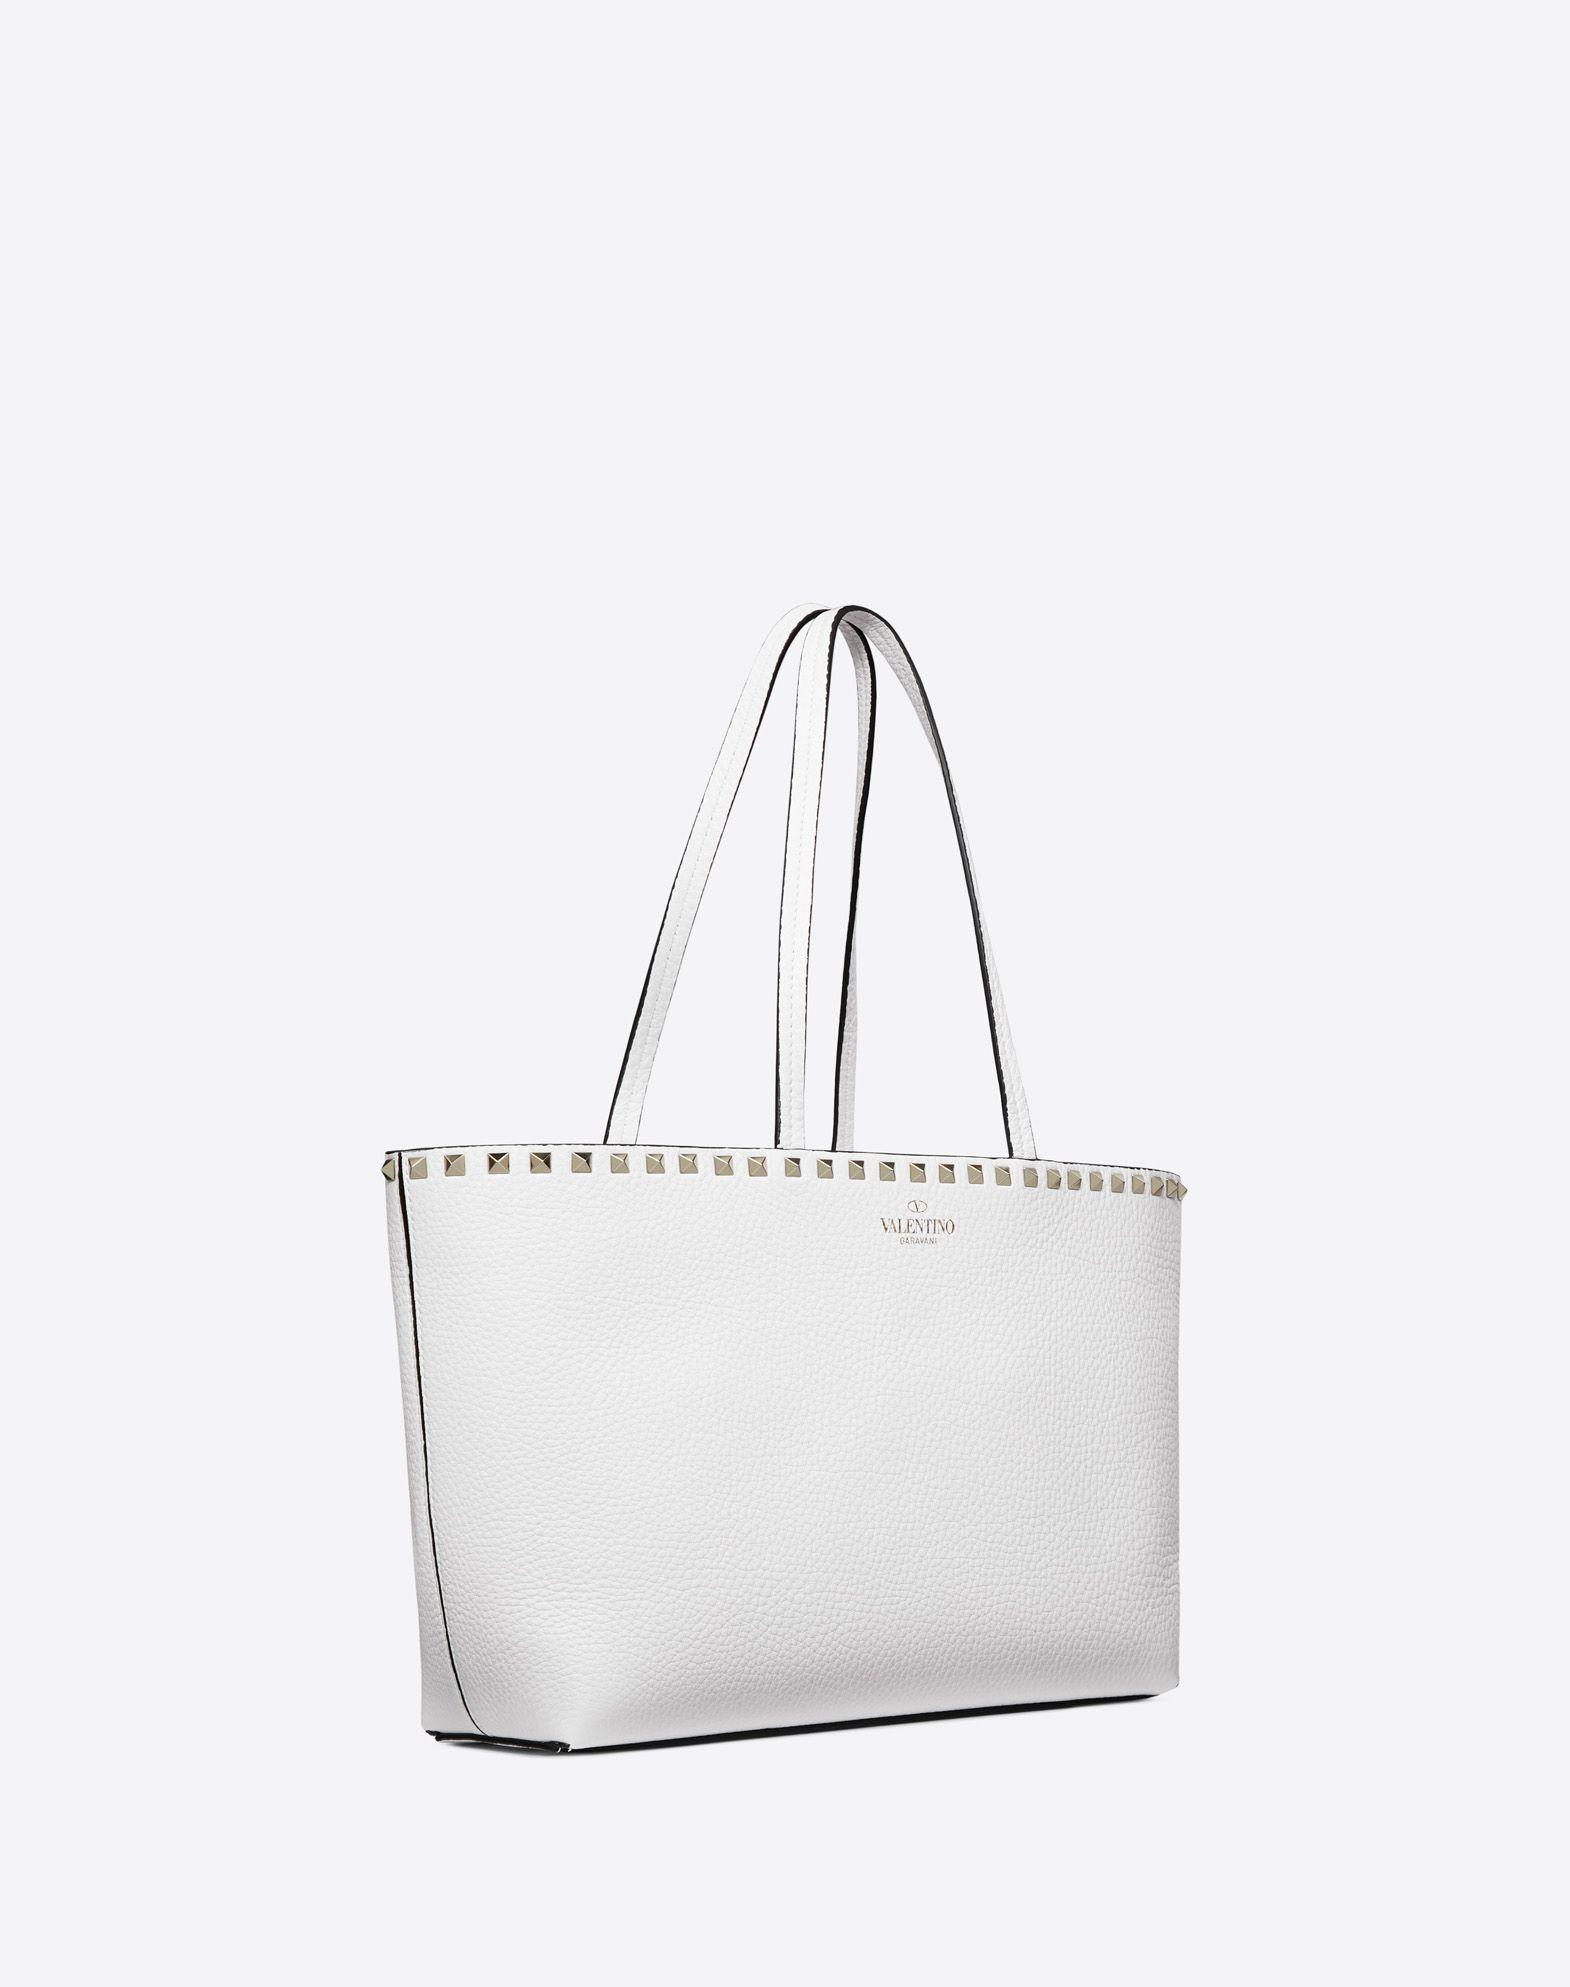 fe3be4c57 Valentino Small Rockstud Shopper in White - Lyst